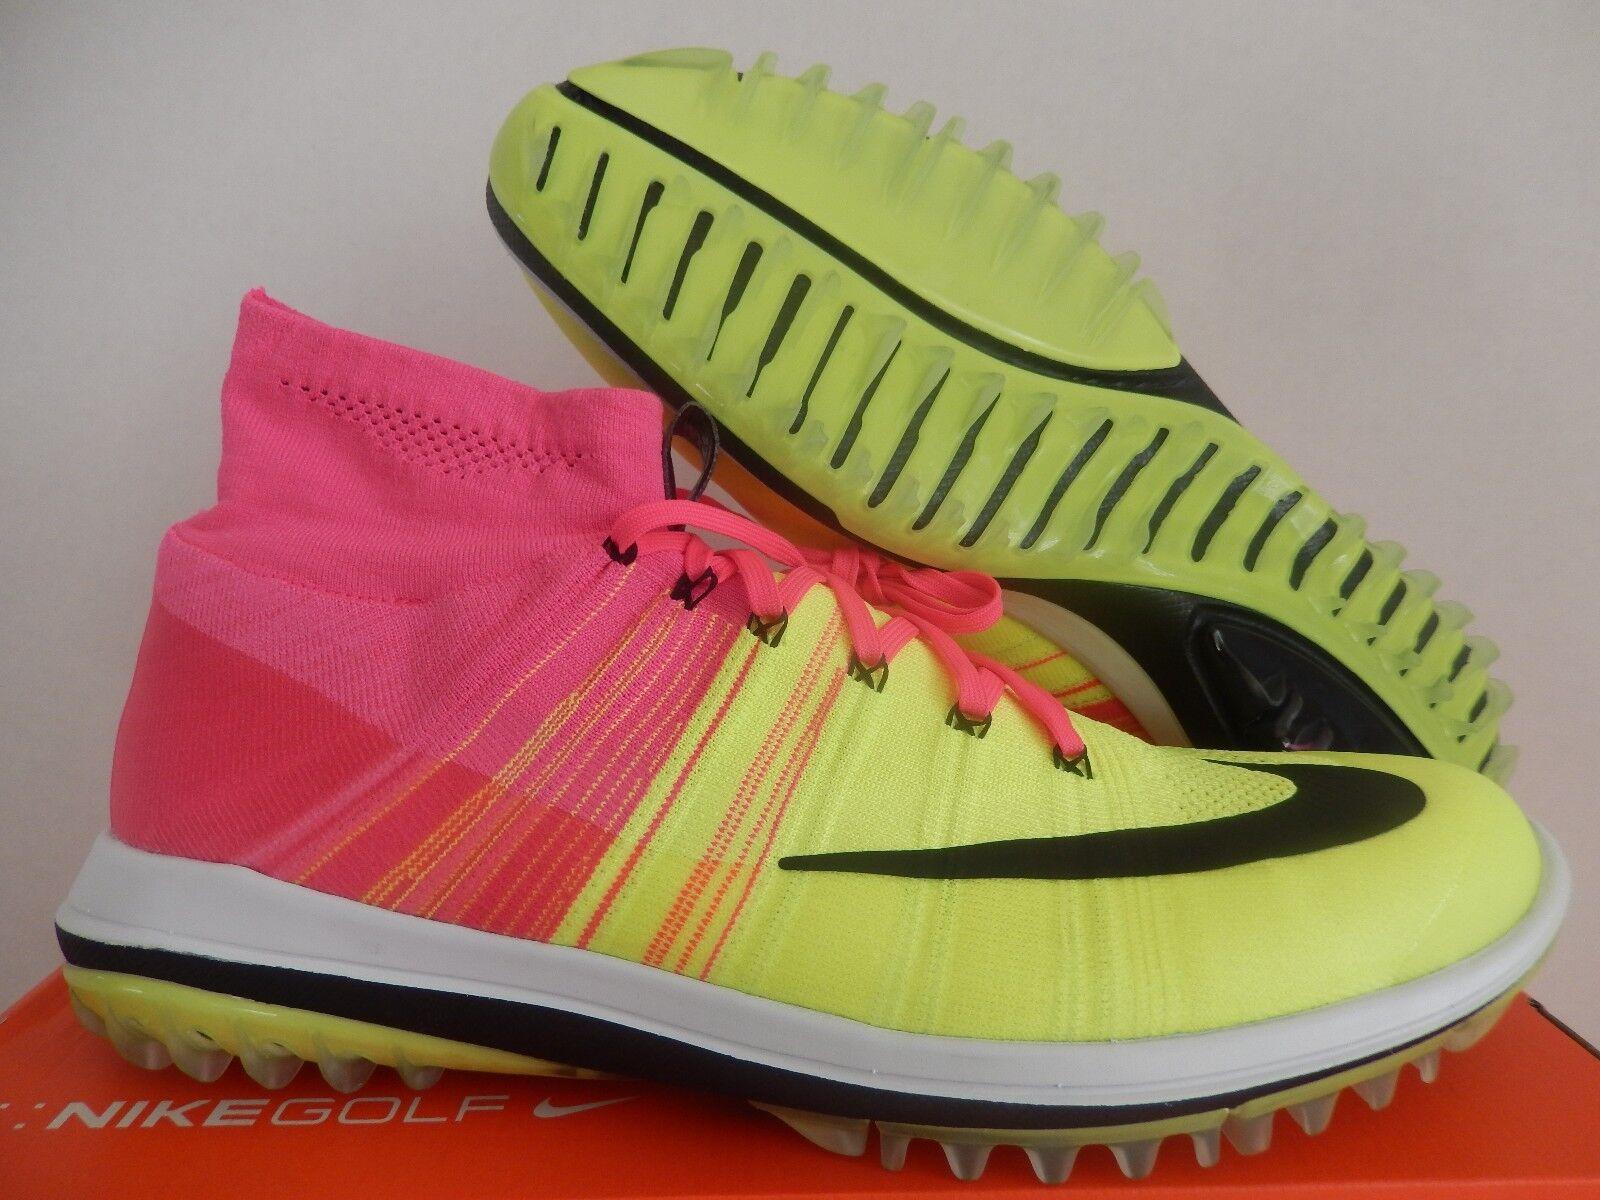 a0839db516ca Nike Flyknit Elite Golf Shoes Pink Blast Volt White Black Sz ...